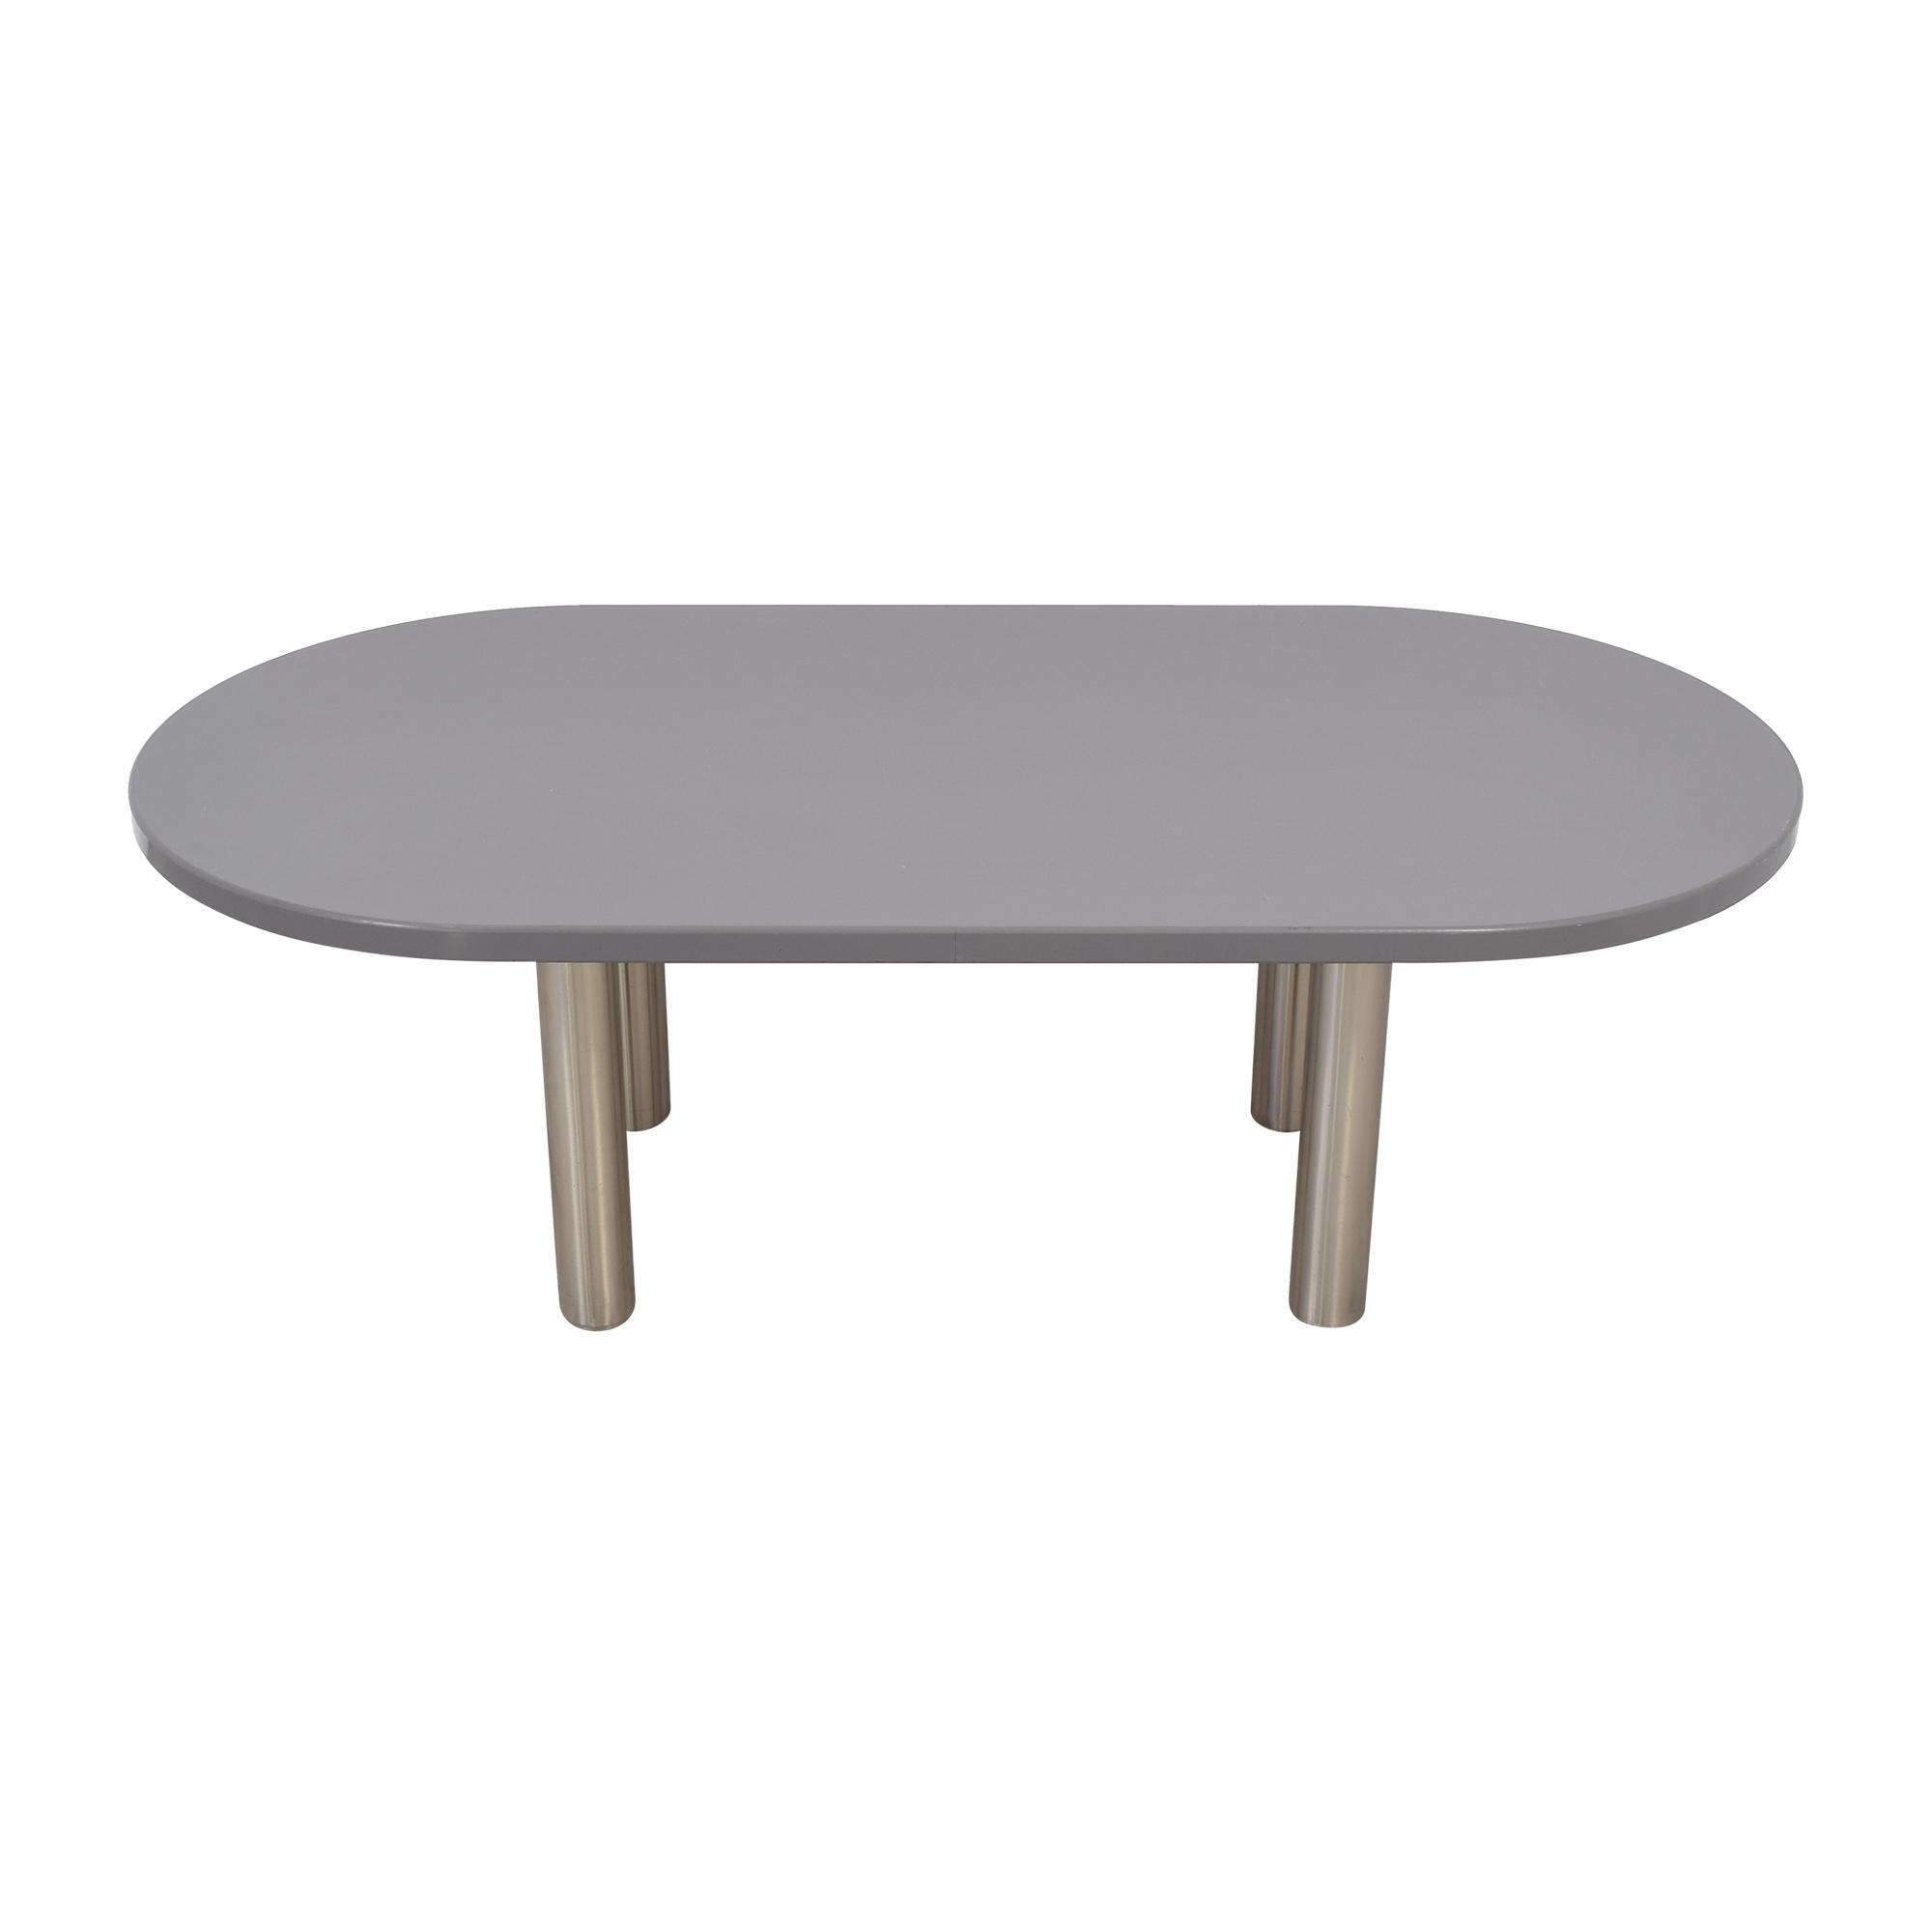 Knoll Knoll Reff Profile Meeting Table coupon